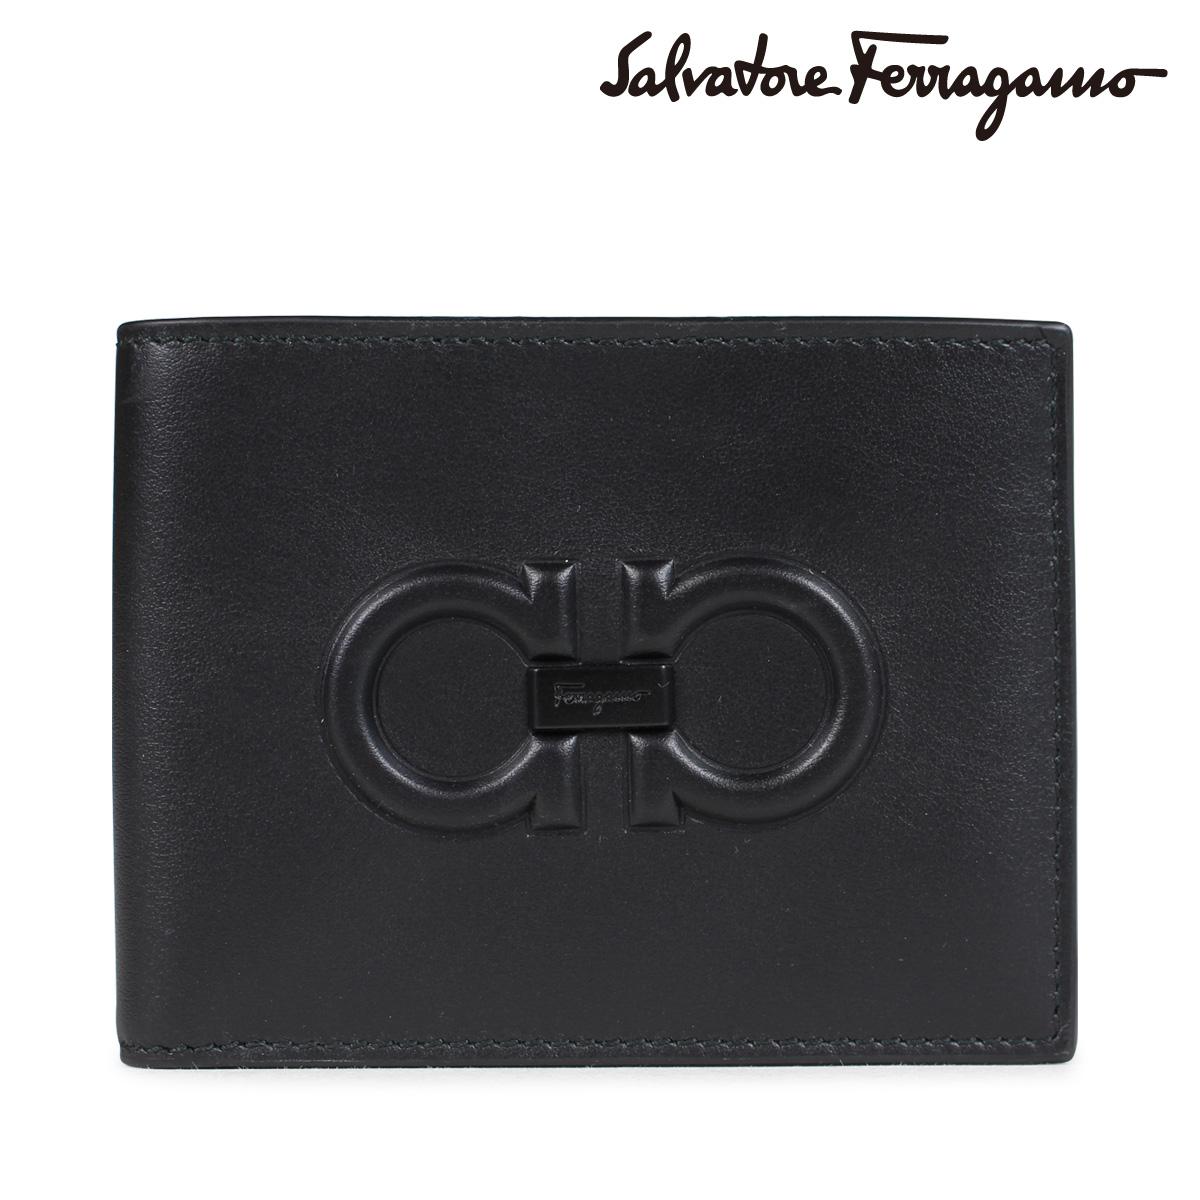 Salvatore Ferragamo 財布 メンズ 二つ折り フェラガモ FIRENZE LOGO WALLET ブラック 66A248 [10/23 新入荷]